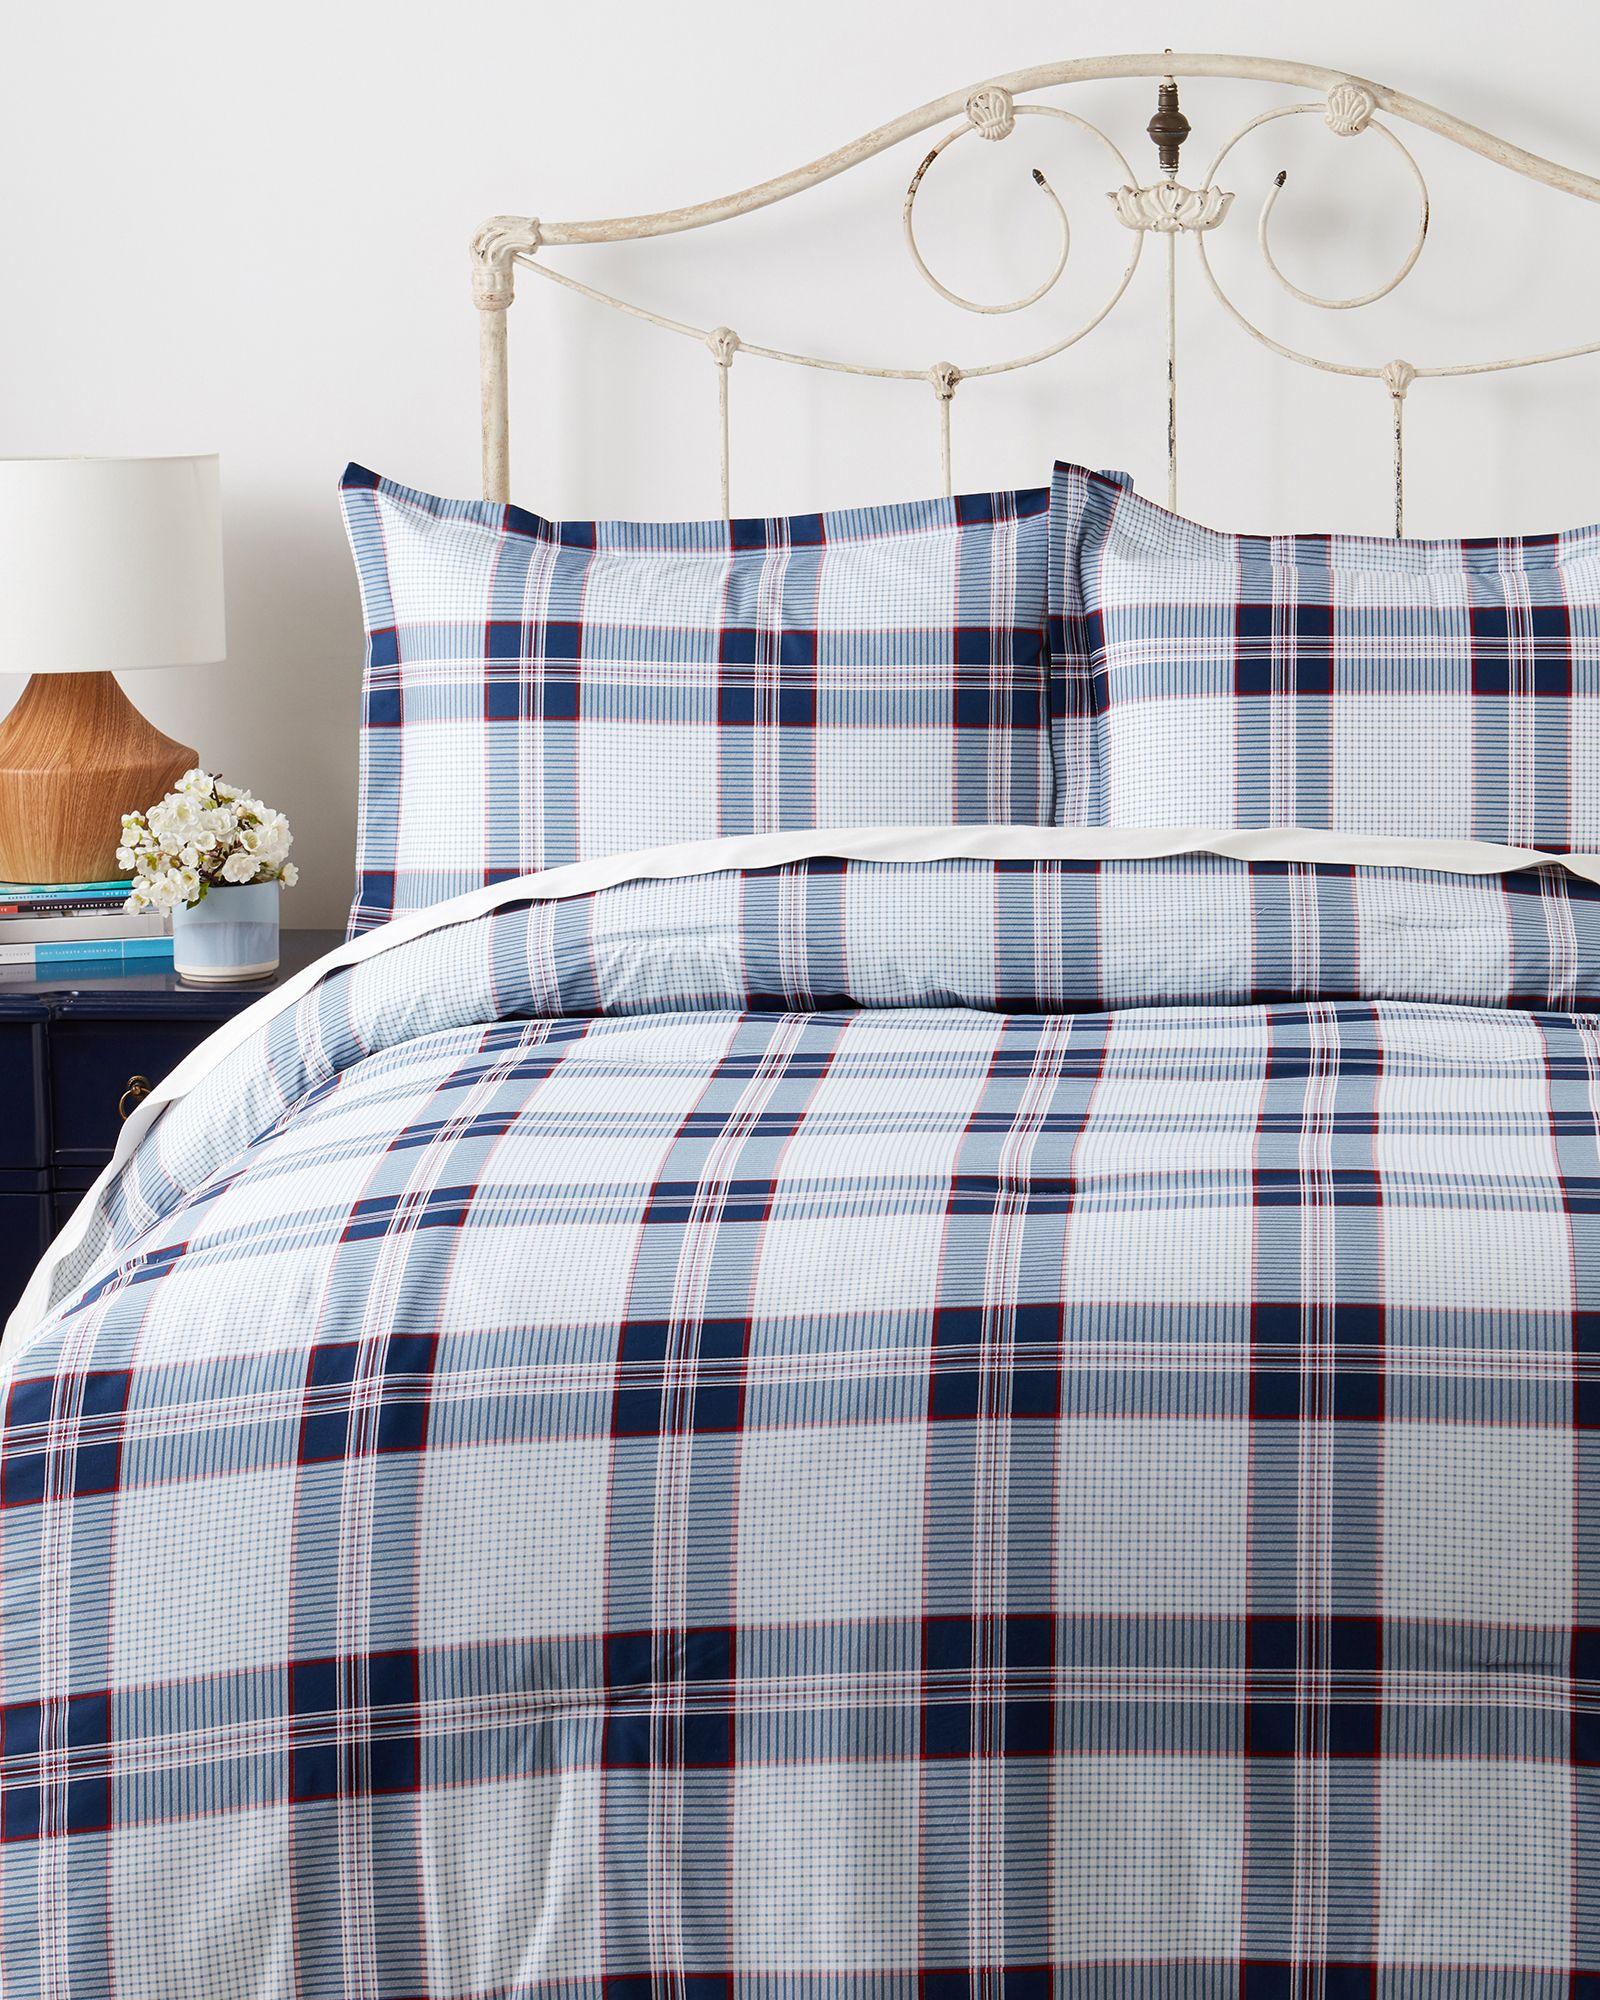 Tommy Hilfiger Navy Light Blue White Plaid Stripe QUEEN Size Sheet Set 4 Piece